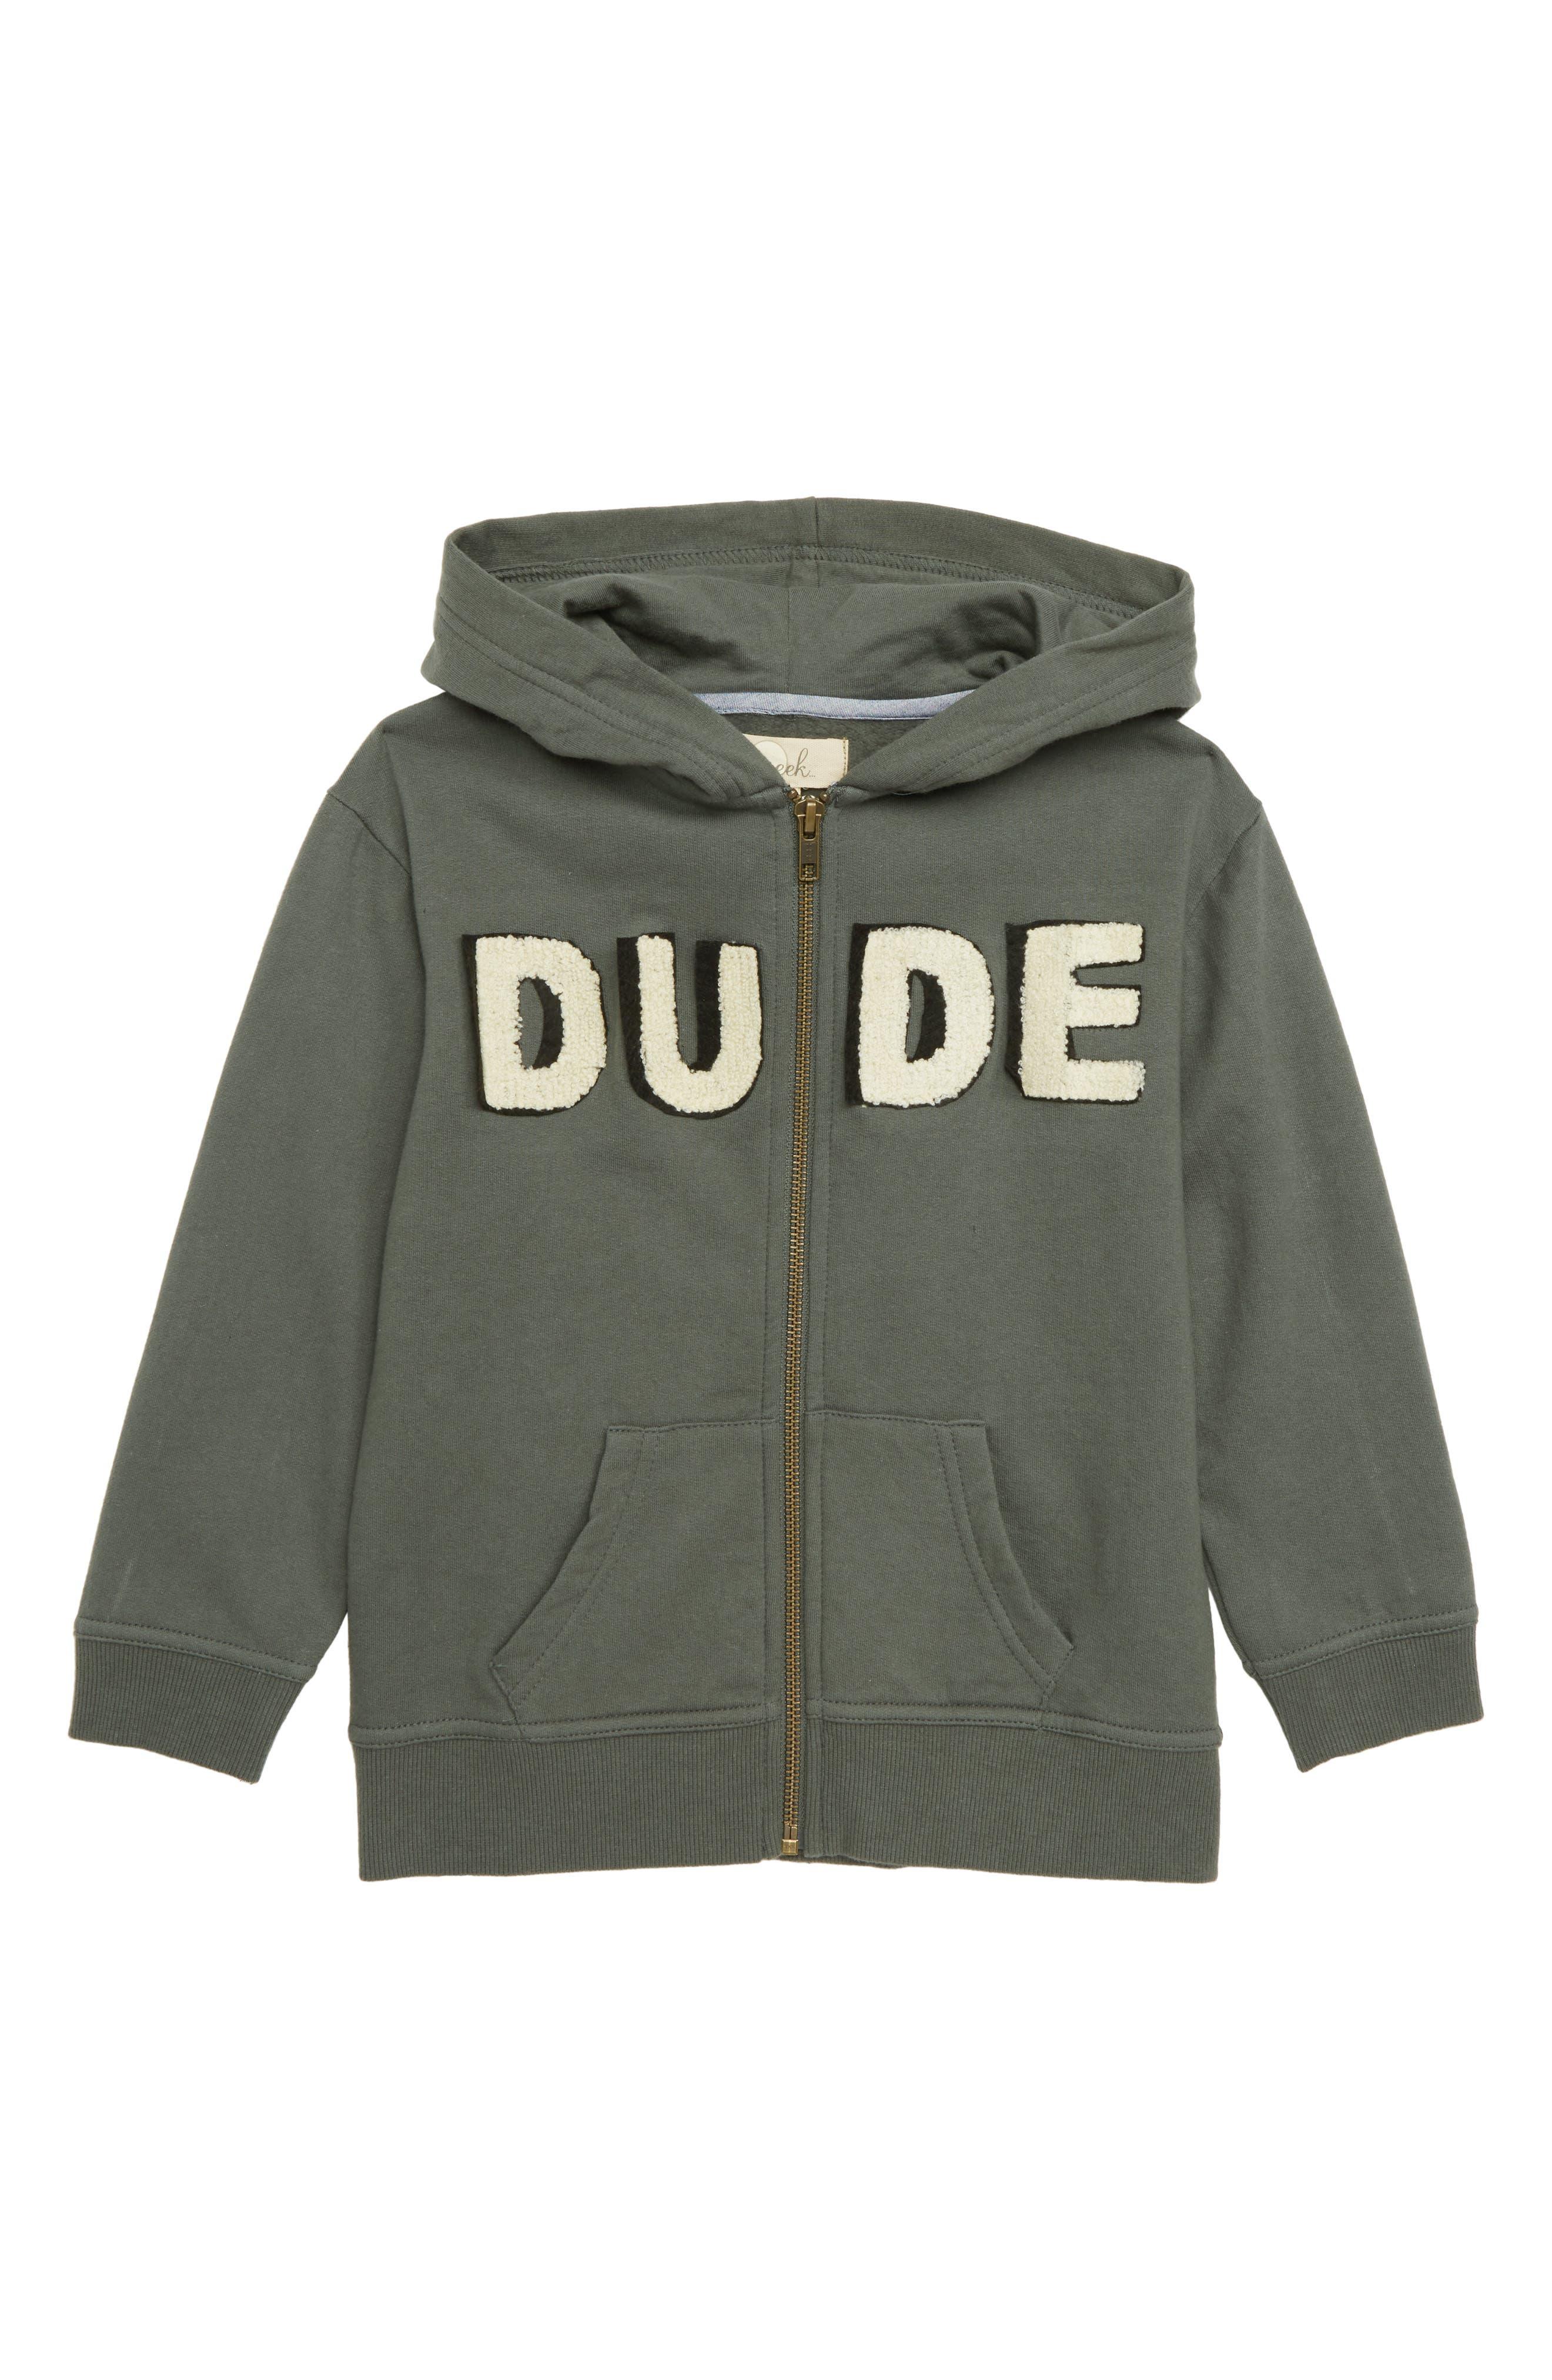 Dude Zip Hoodie,                         Main,                         color, OLIVE GREEN